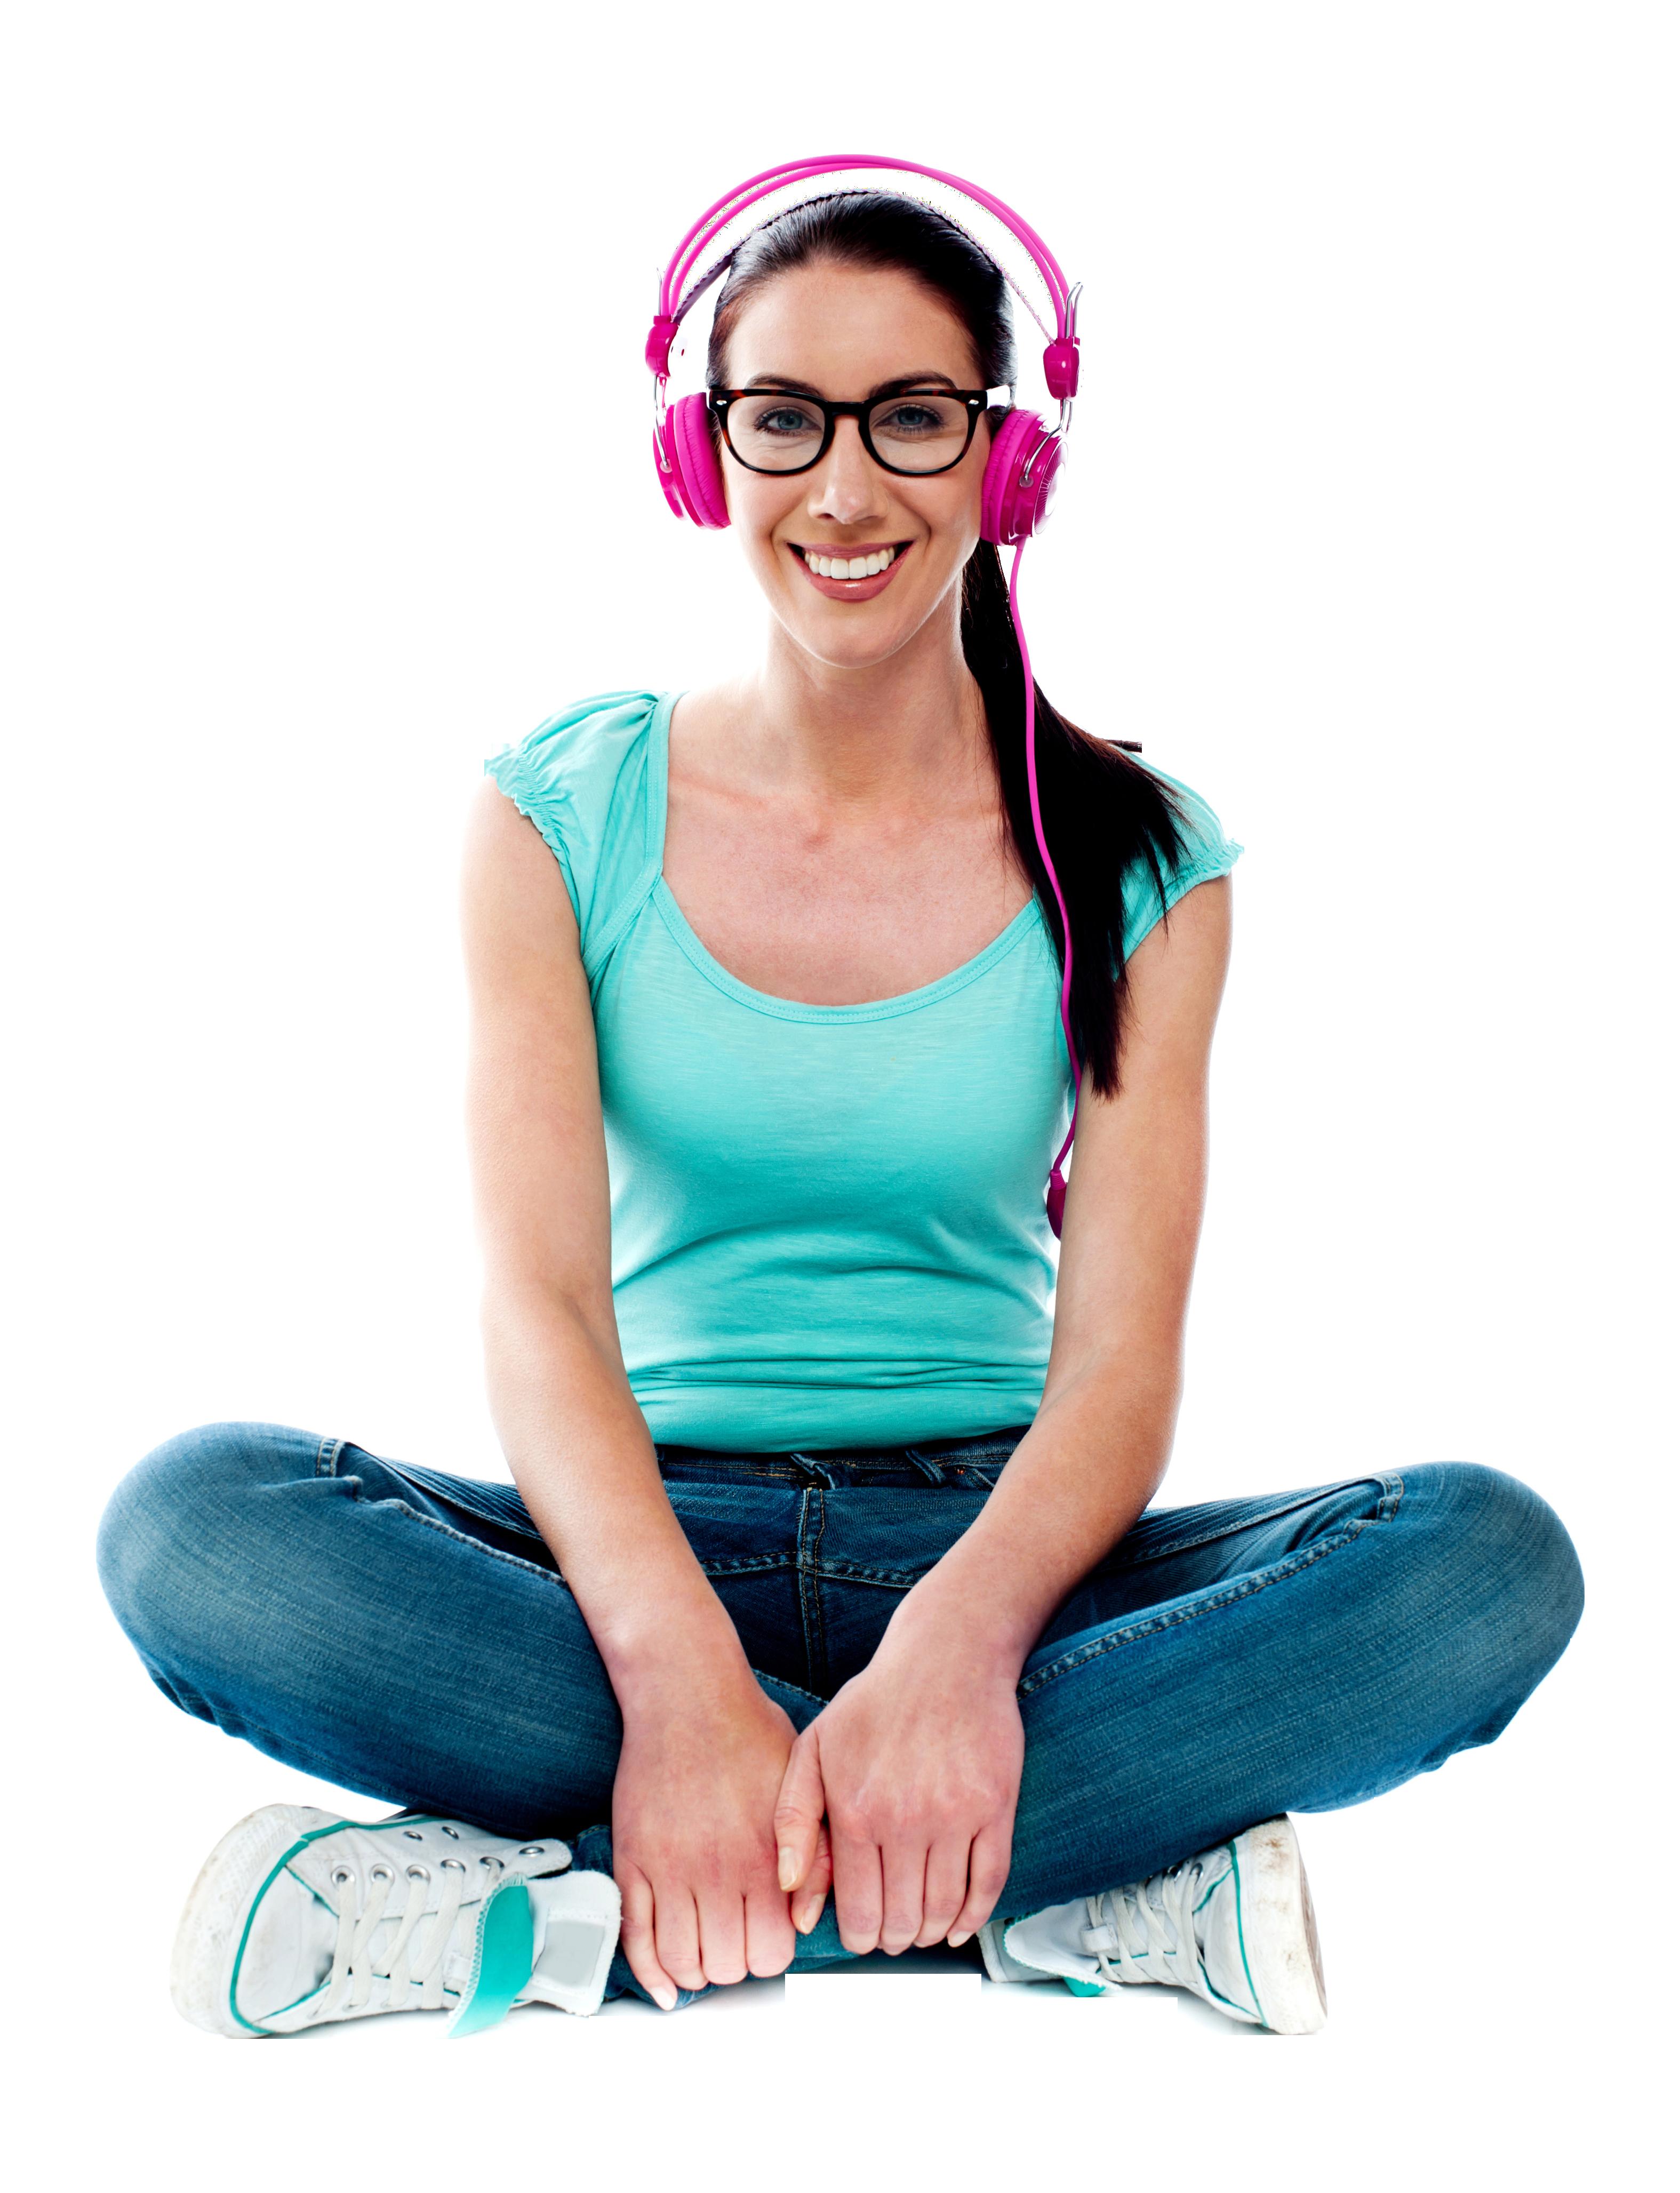 Women Listening Music PNG Image